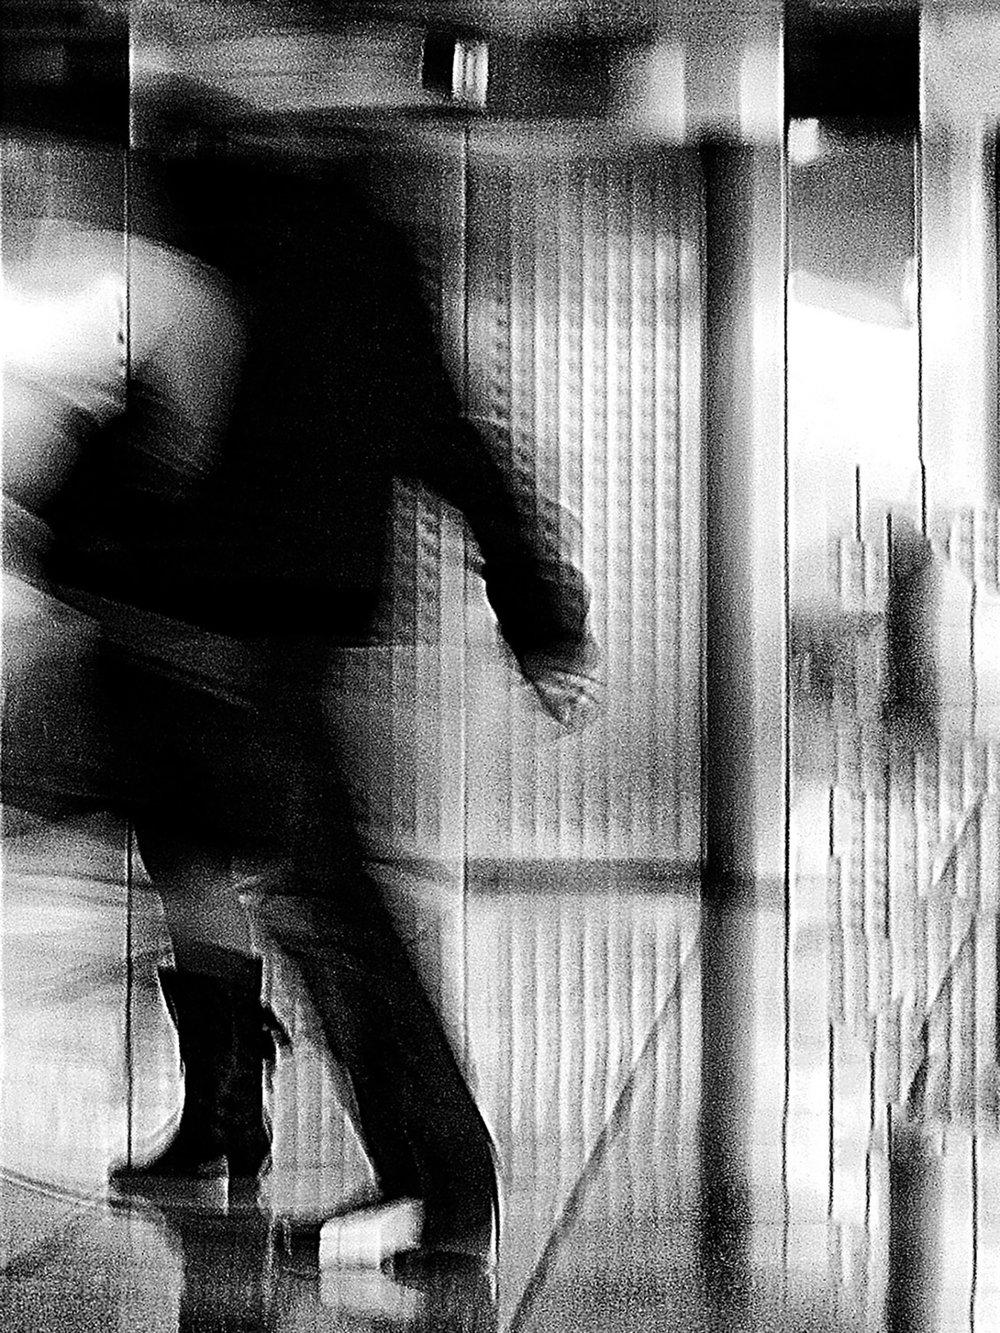 Shifra_Levyathan_In motion_06.jpg